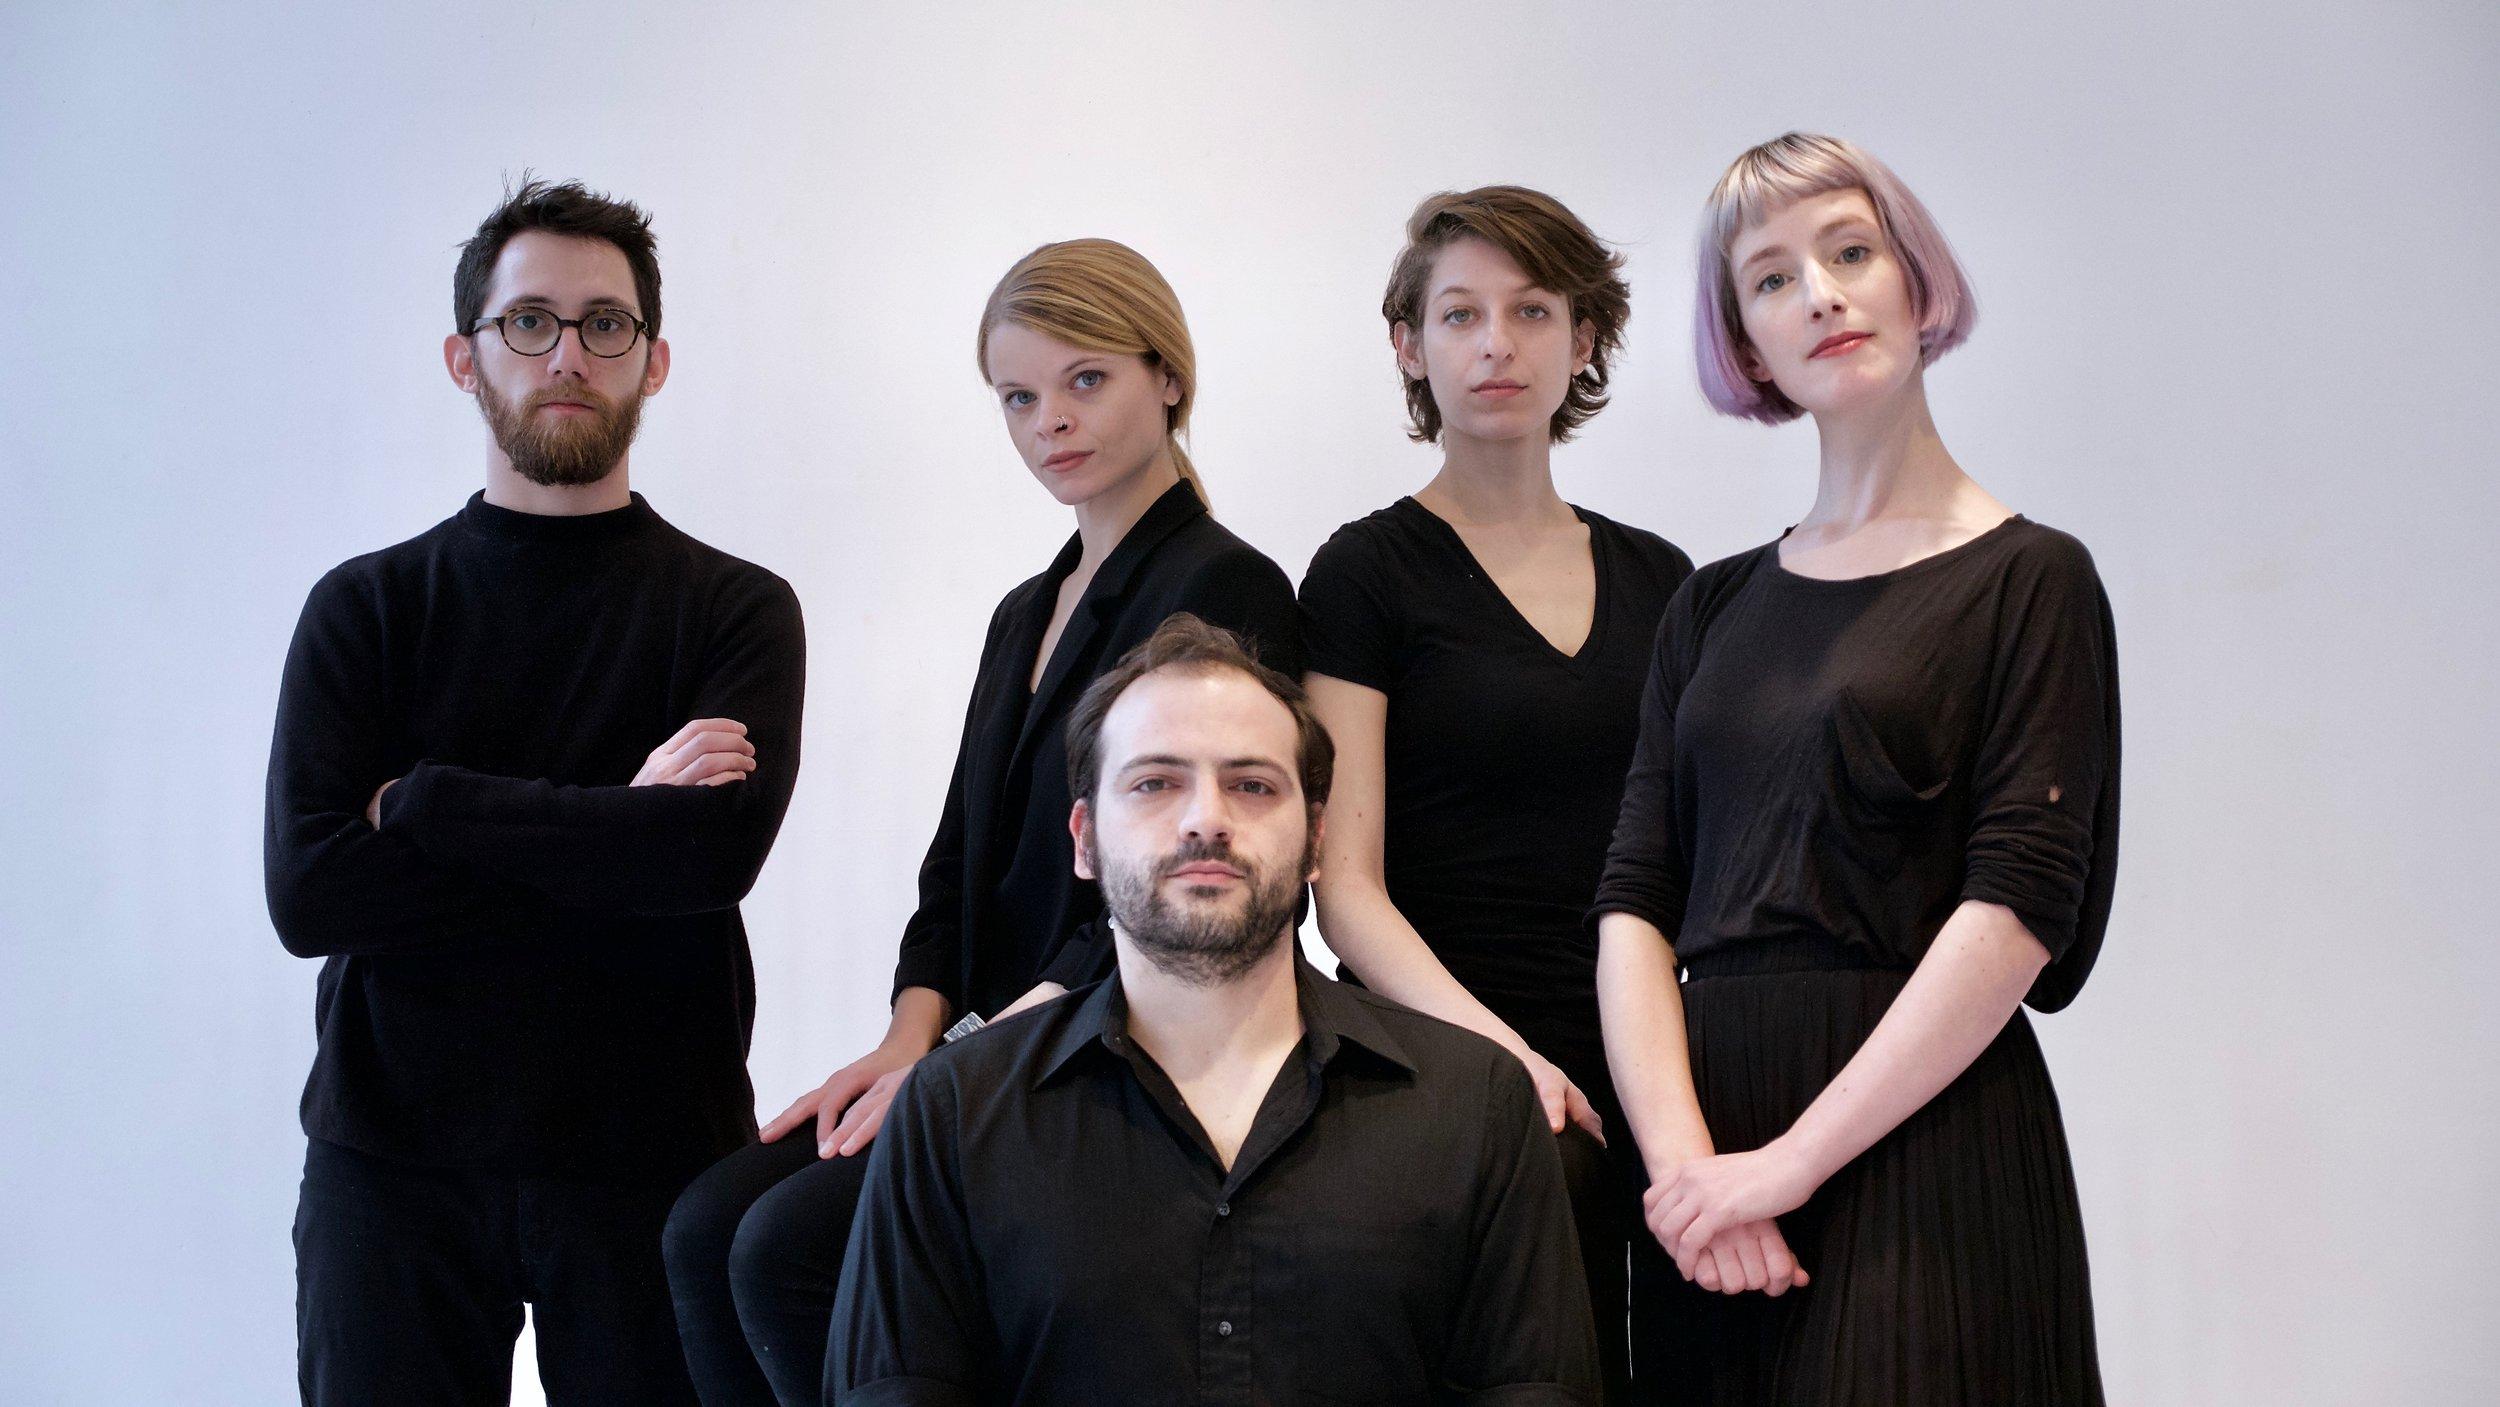 TAK ensemble (left to right): Carlos Cordeiro, Laura Cocks, Ellery Trafford, Marina Kifferstein, and Charlotte Mundy